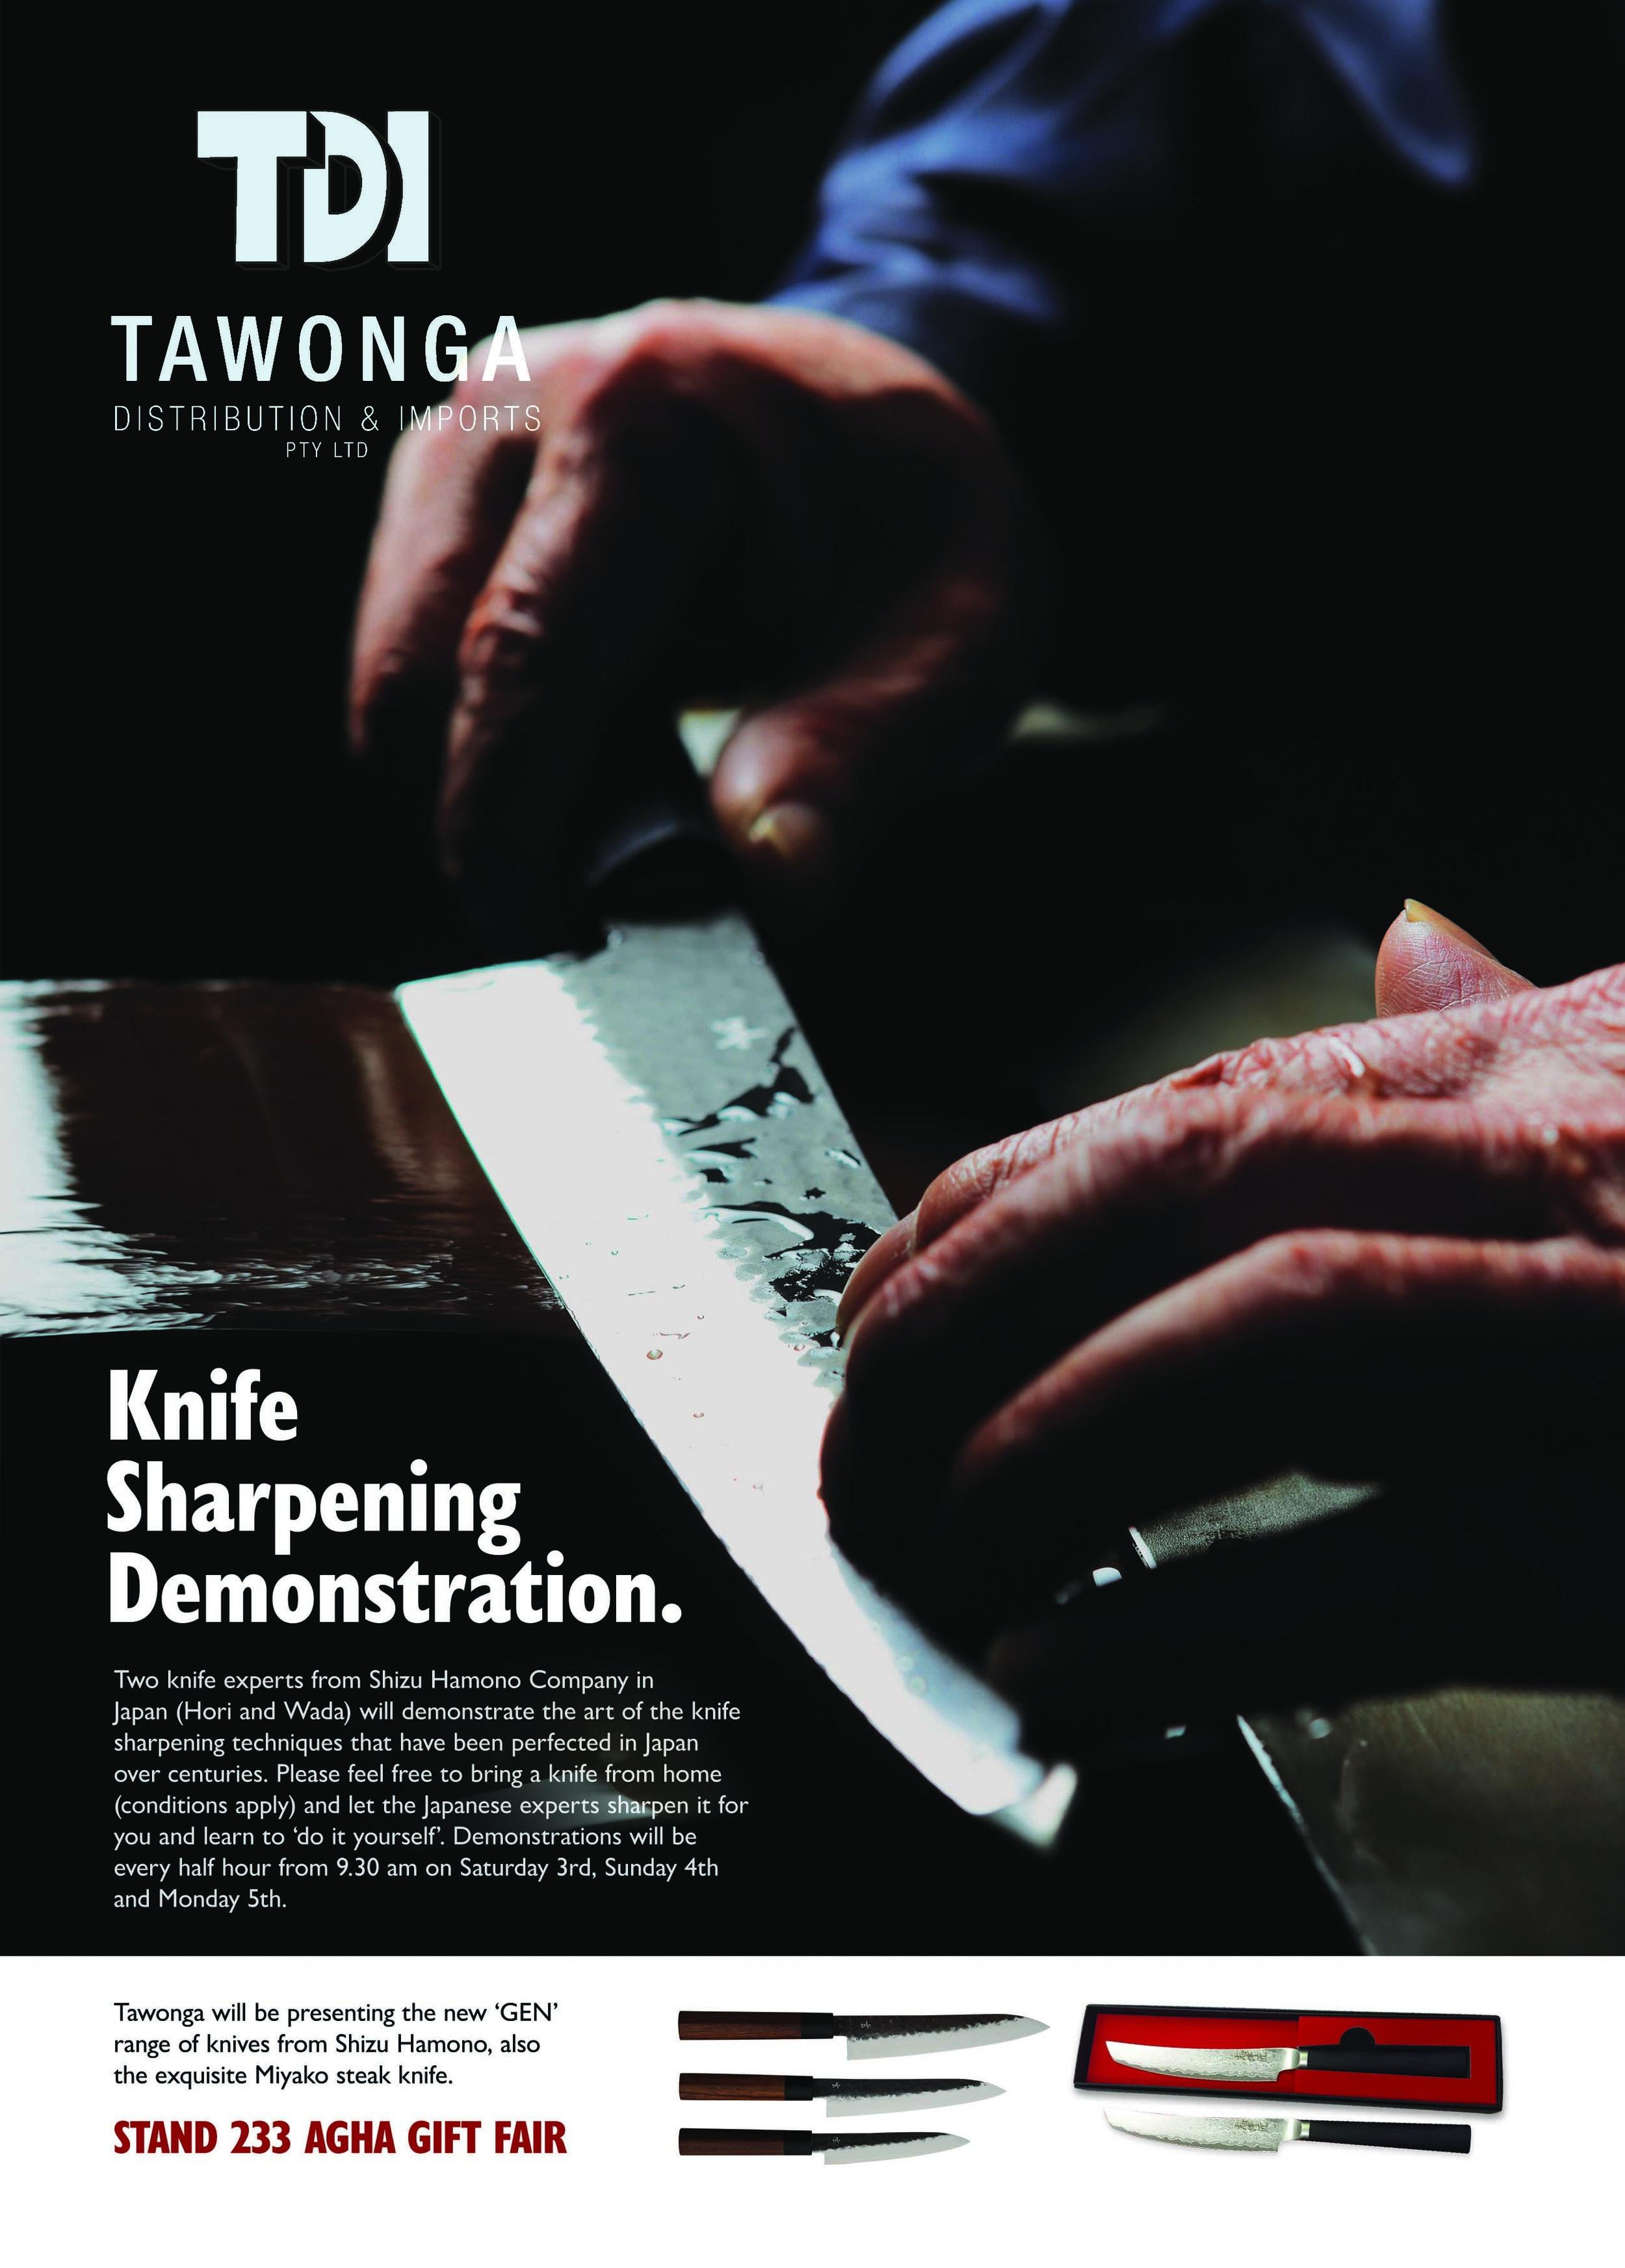 Tawonga-AGHA Hand sharpening demonstration.jpg